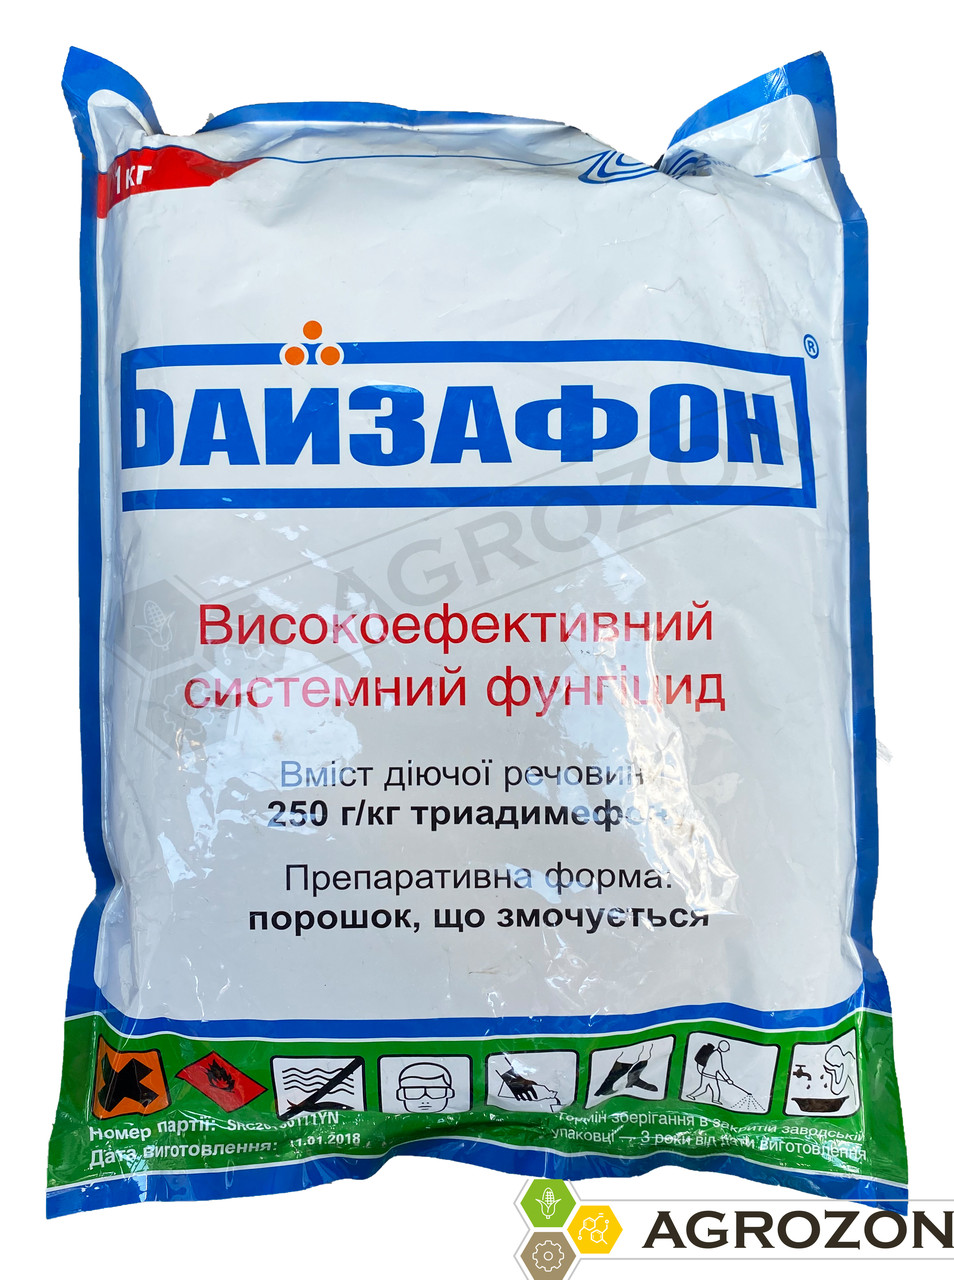 Фунгицид Байзафон (Байлетон) Химагромаркетинг - 1 кг